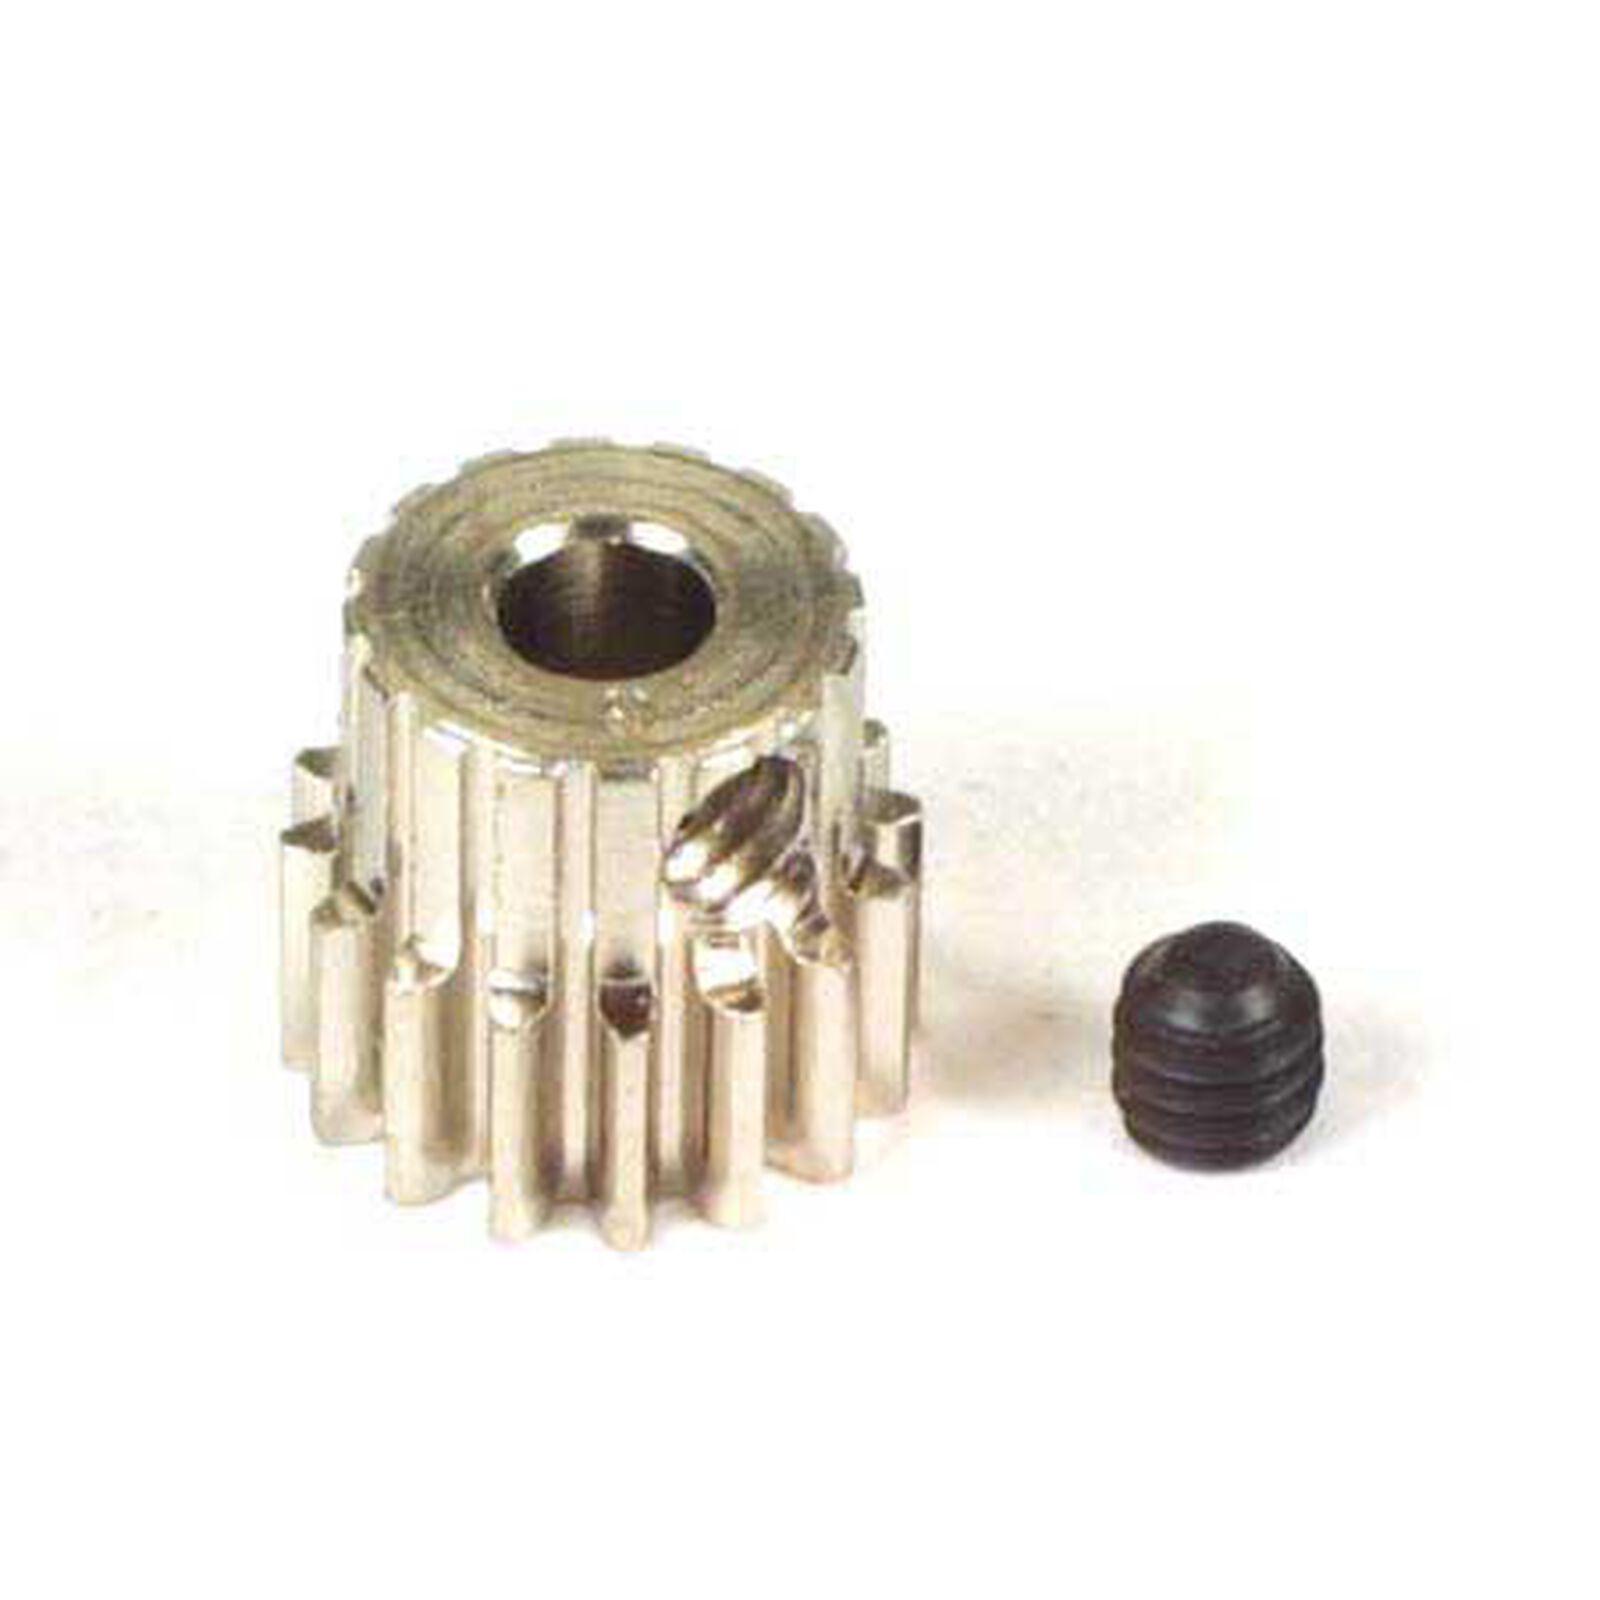 48 Pitch Pinion Gear, 28T